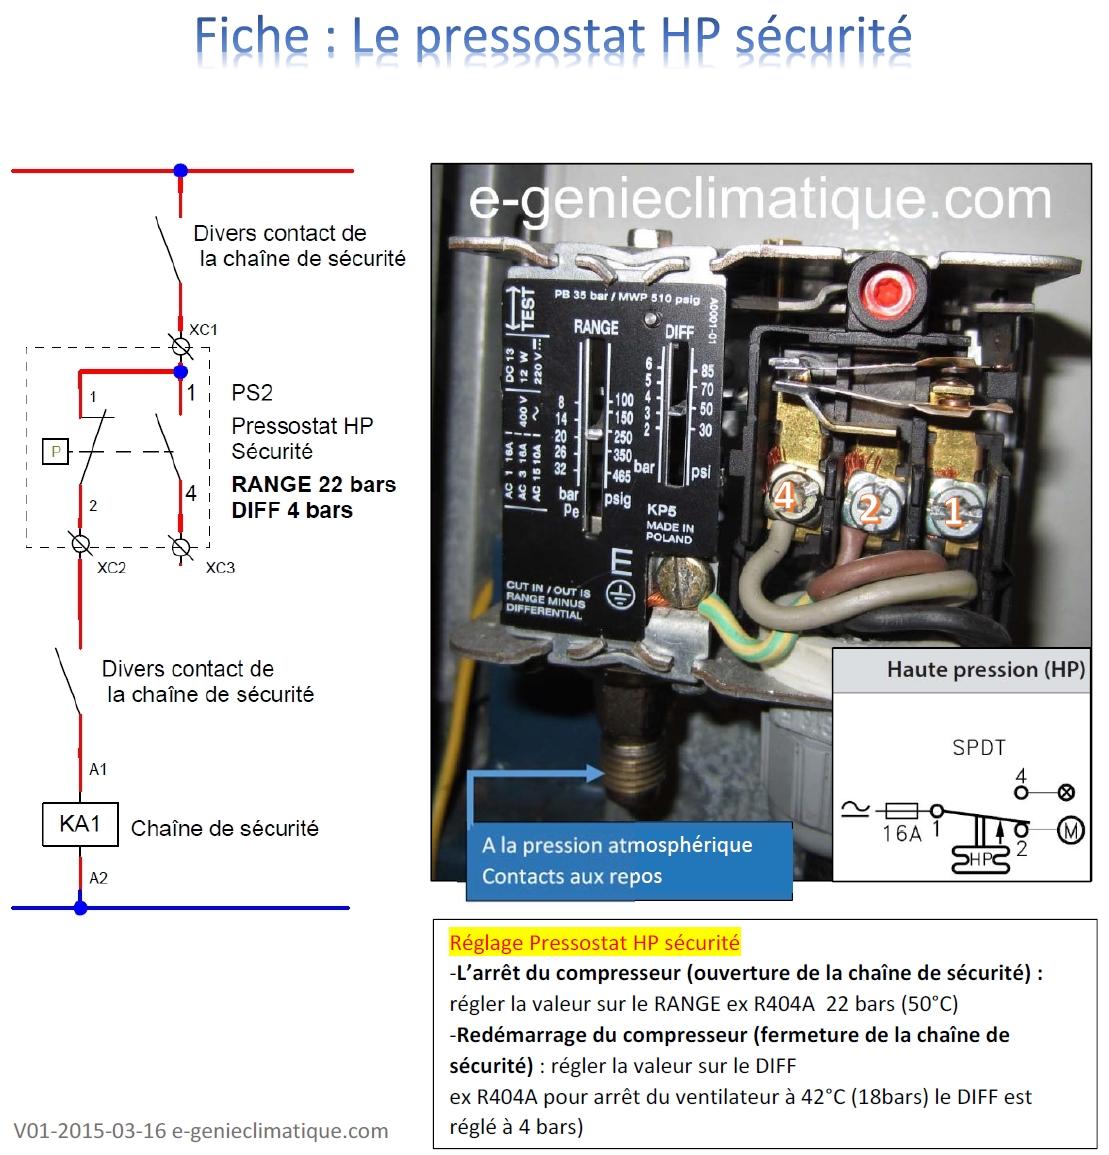 Fiche_le_pressostat_hp_securite_comrpesseur_chaine_de_securite